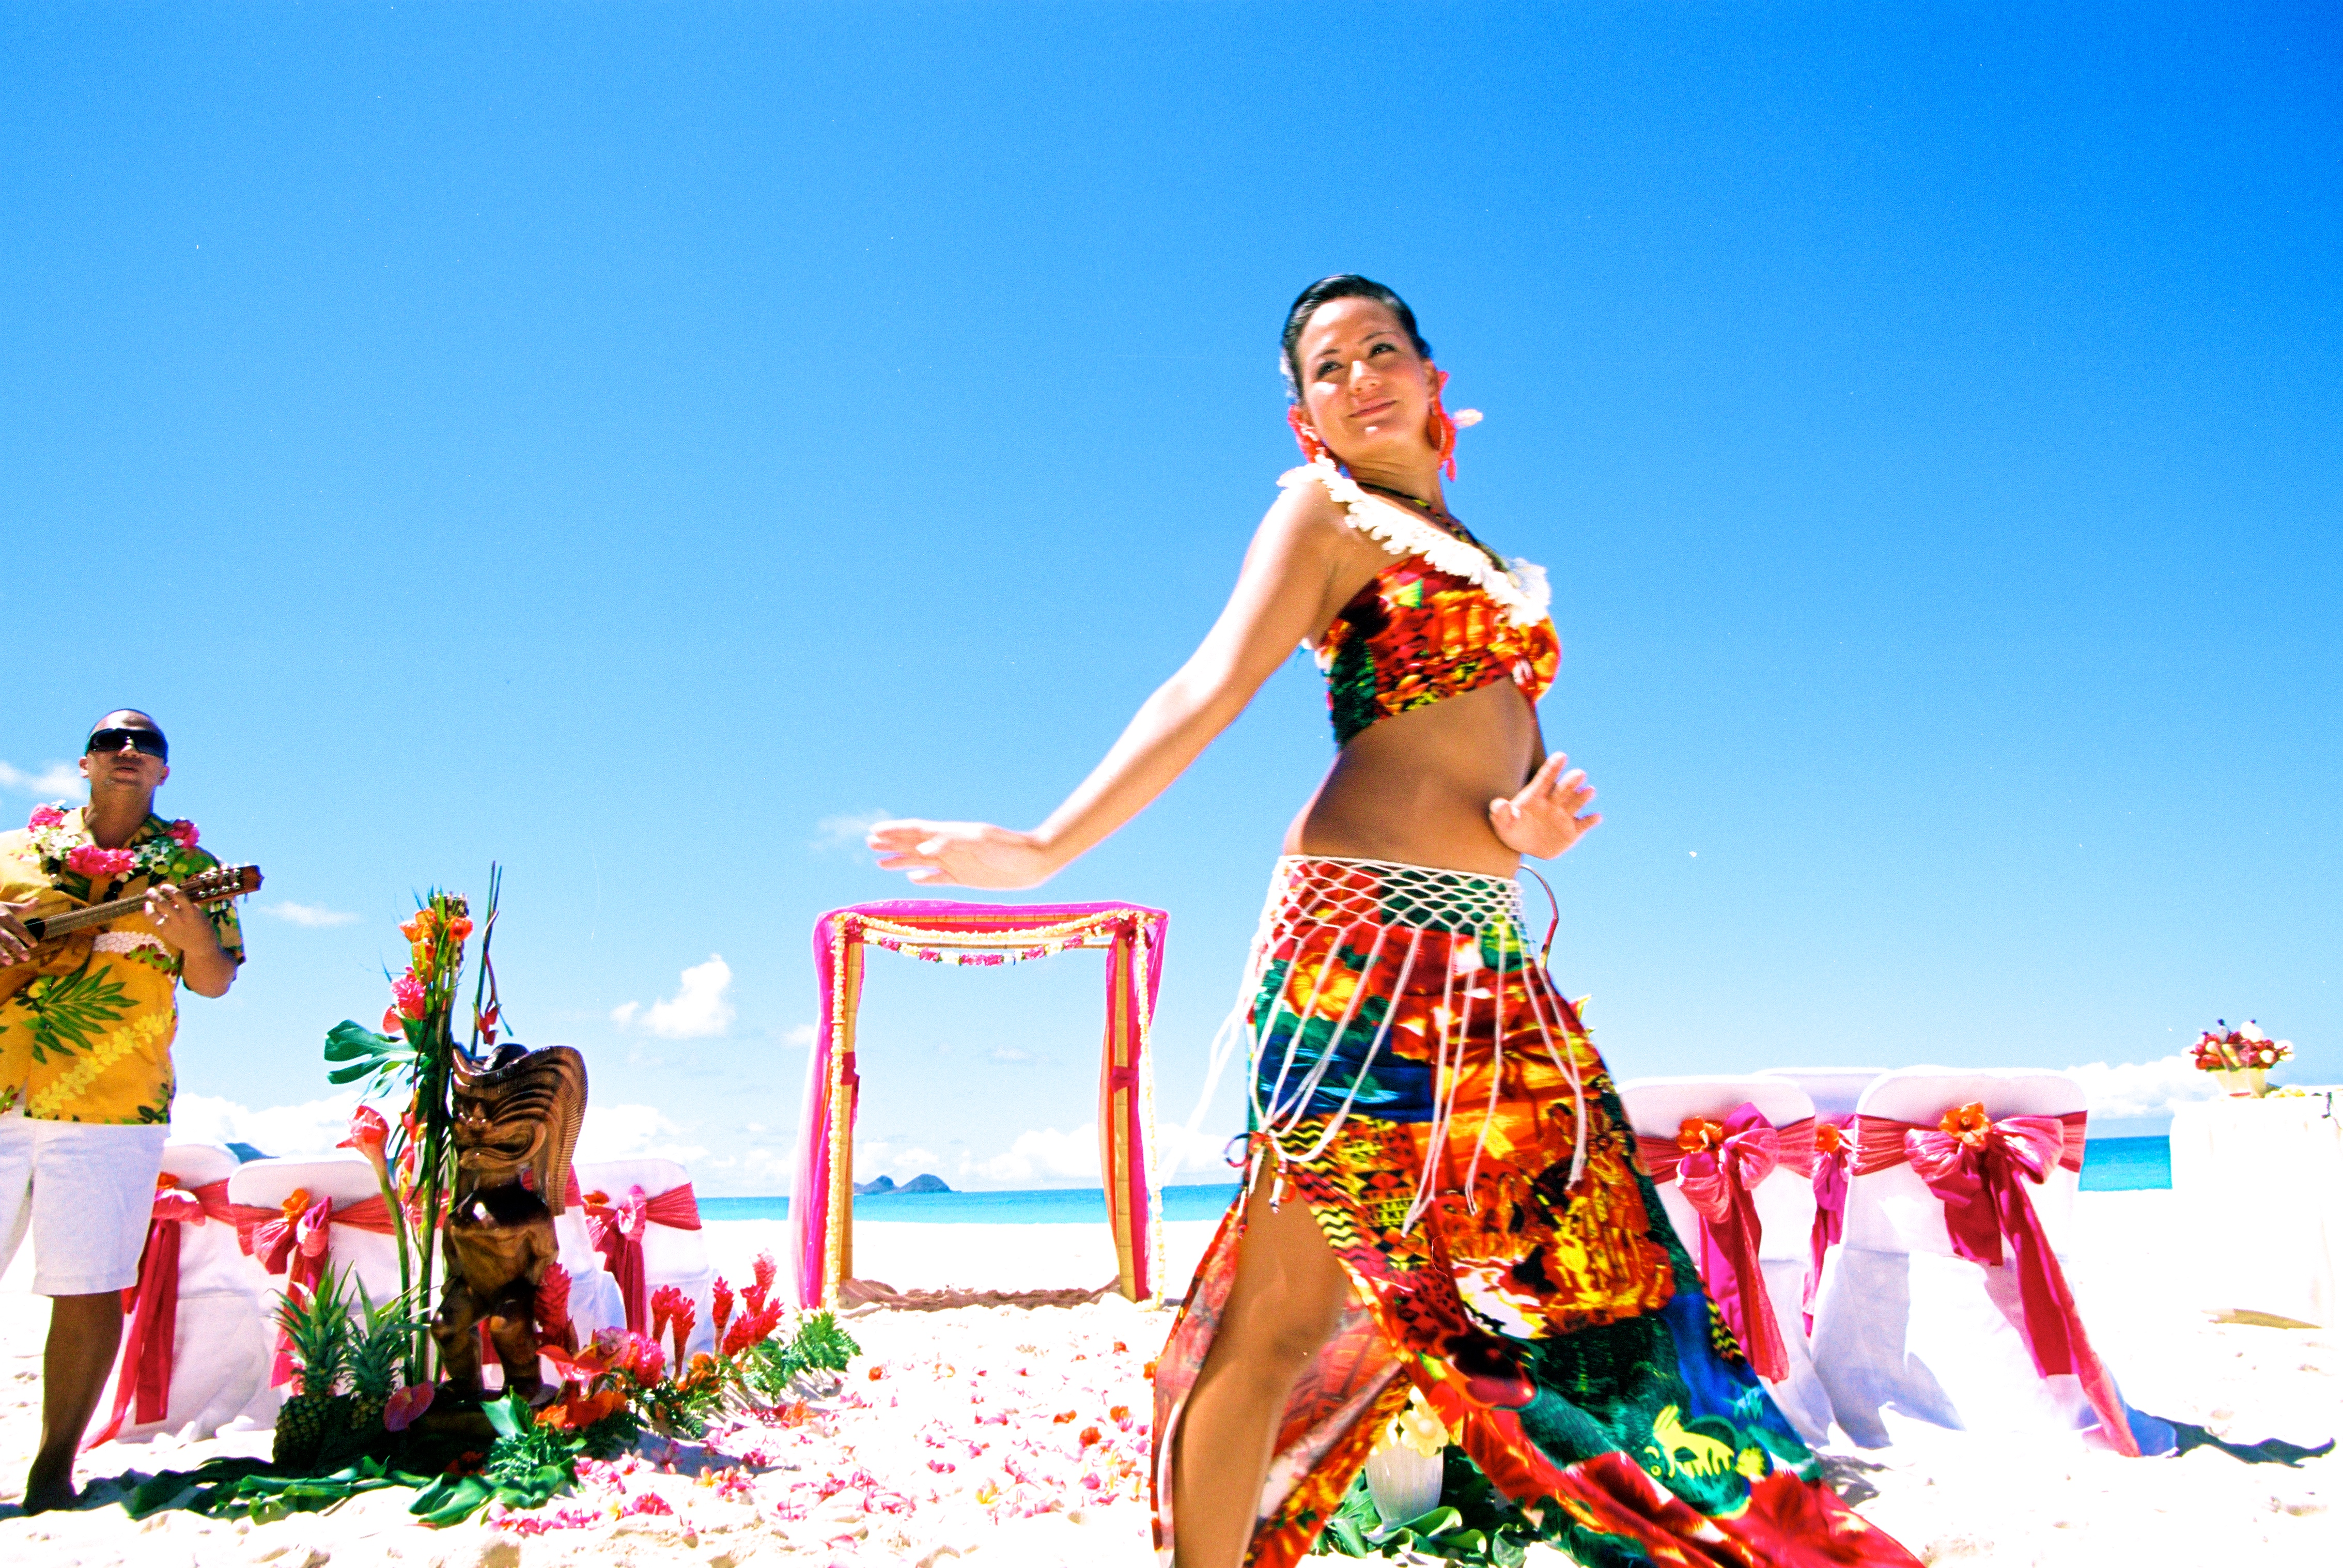 Hawaiian hula dancer with Ukulele 3